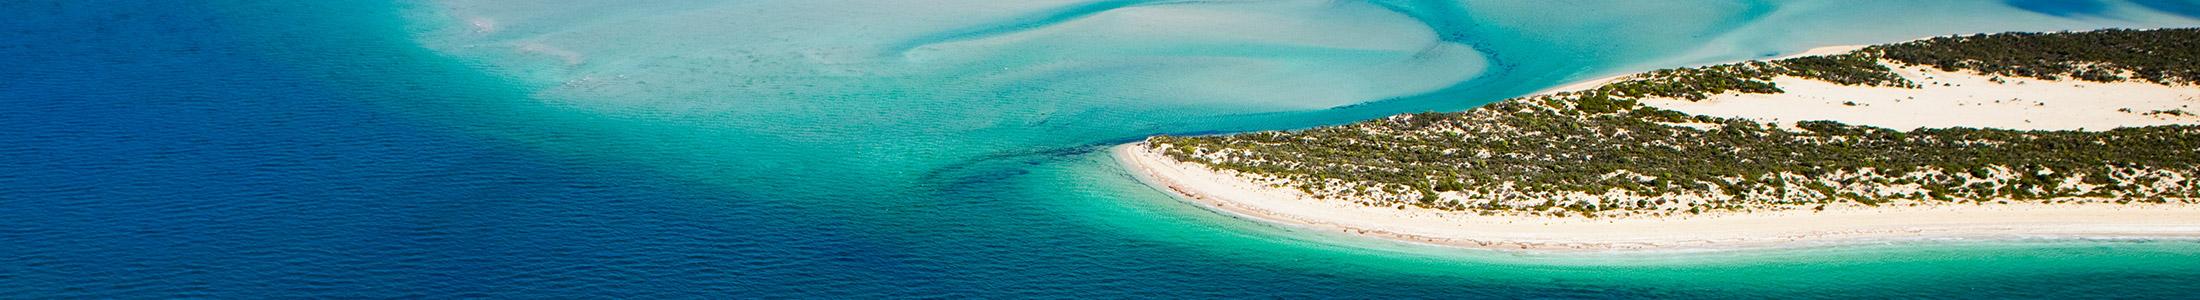 Regional Development Australia Whyalla & Eyre Peninsula